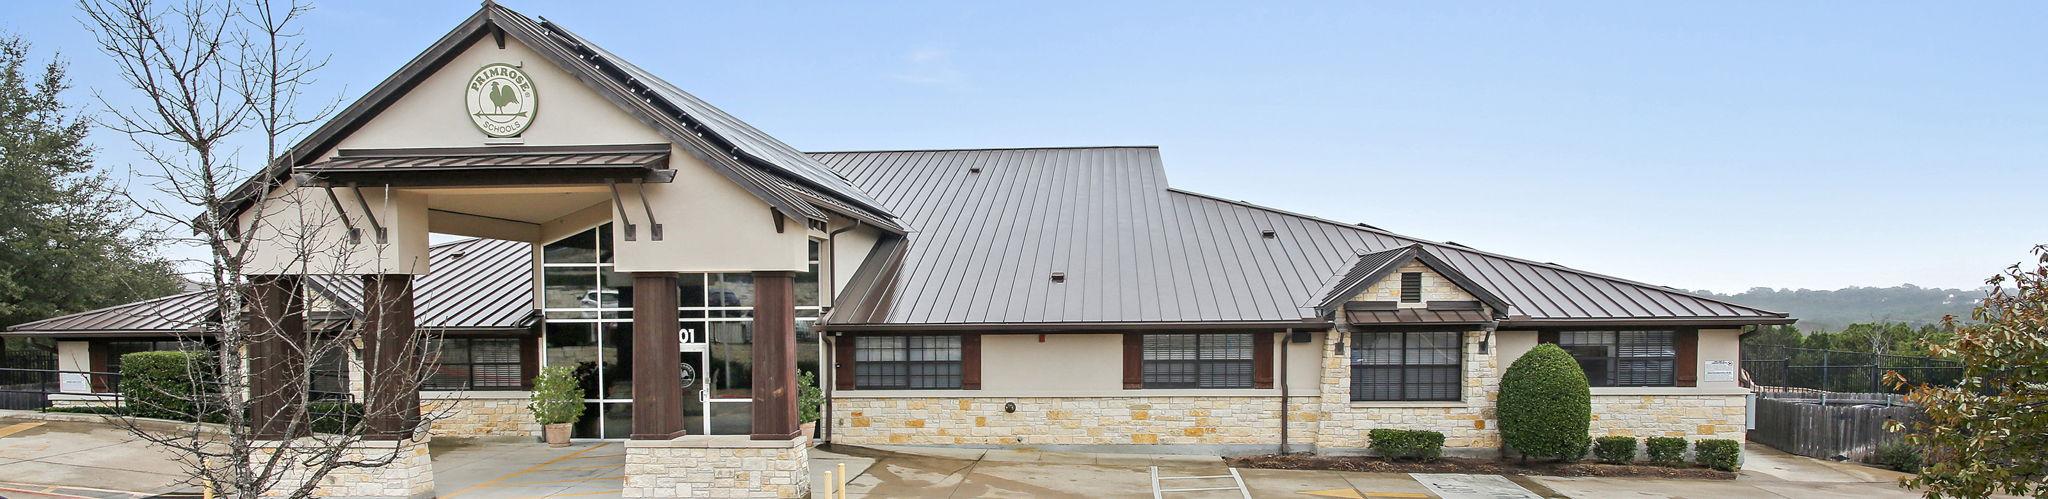 front exterior image of Primrose School of Lakeway